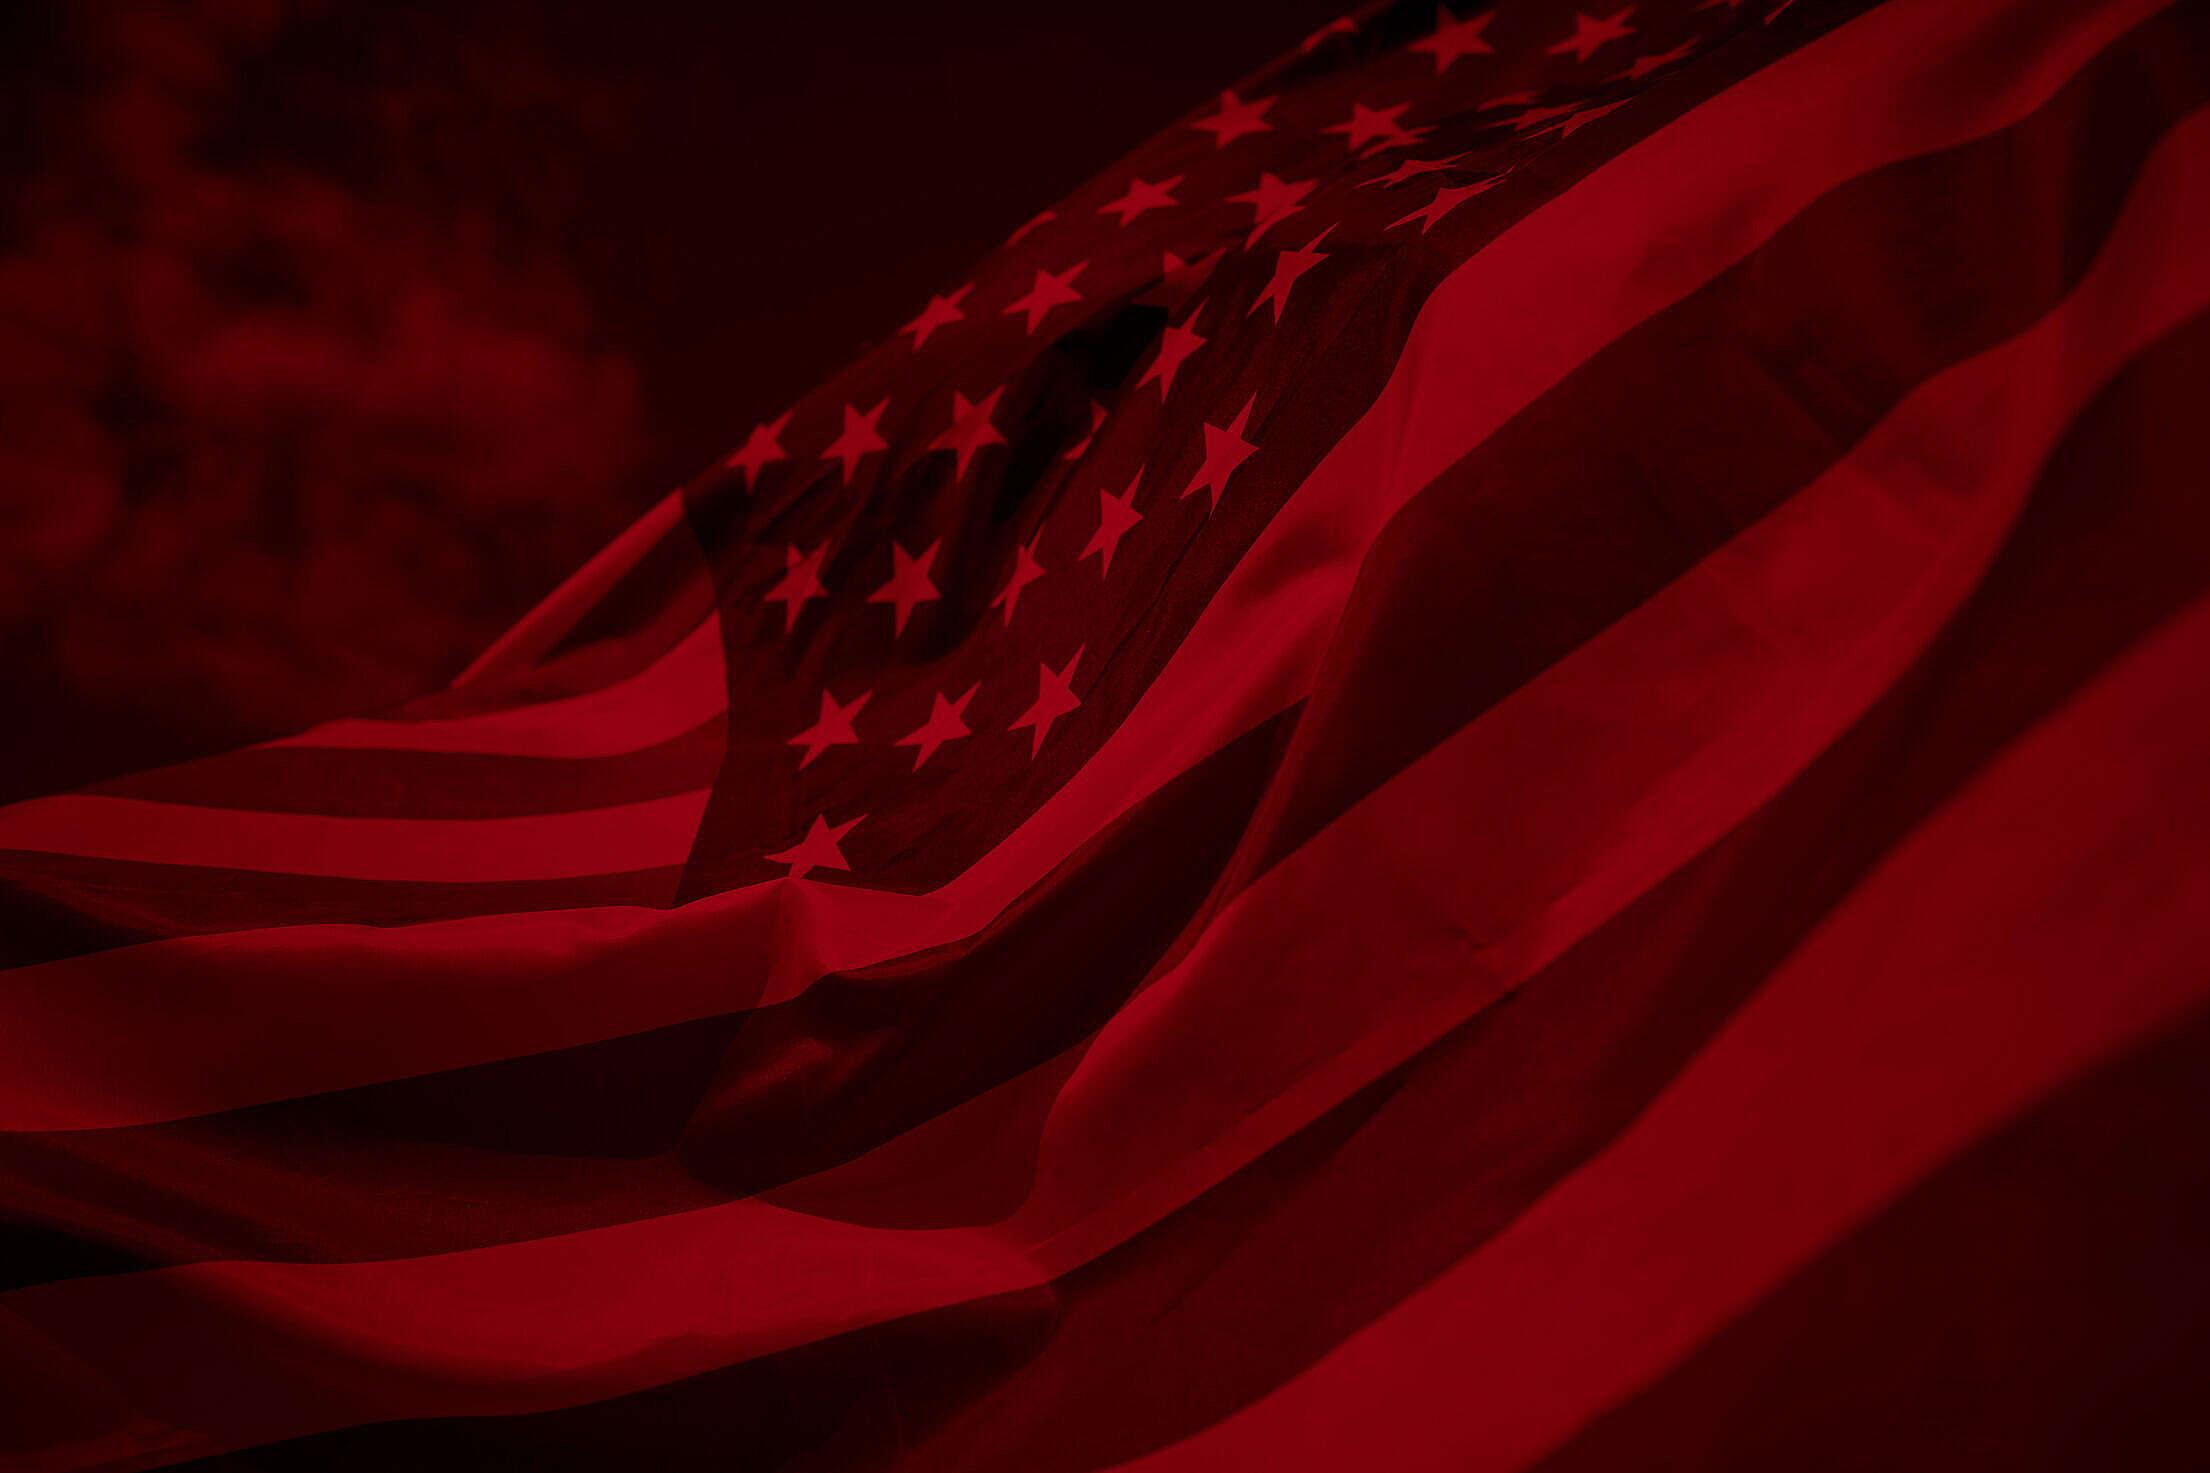 USA Flag Duotone Free Stock Photo